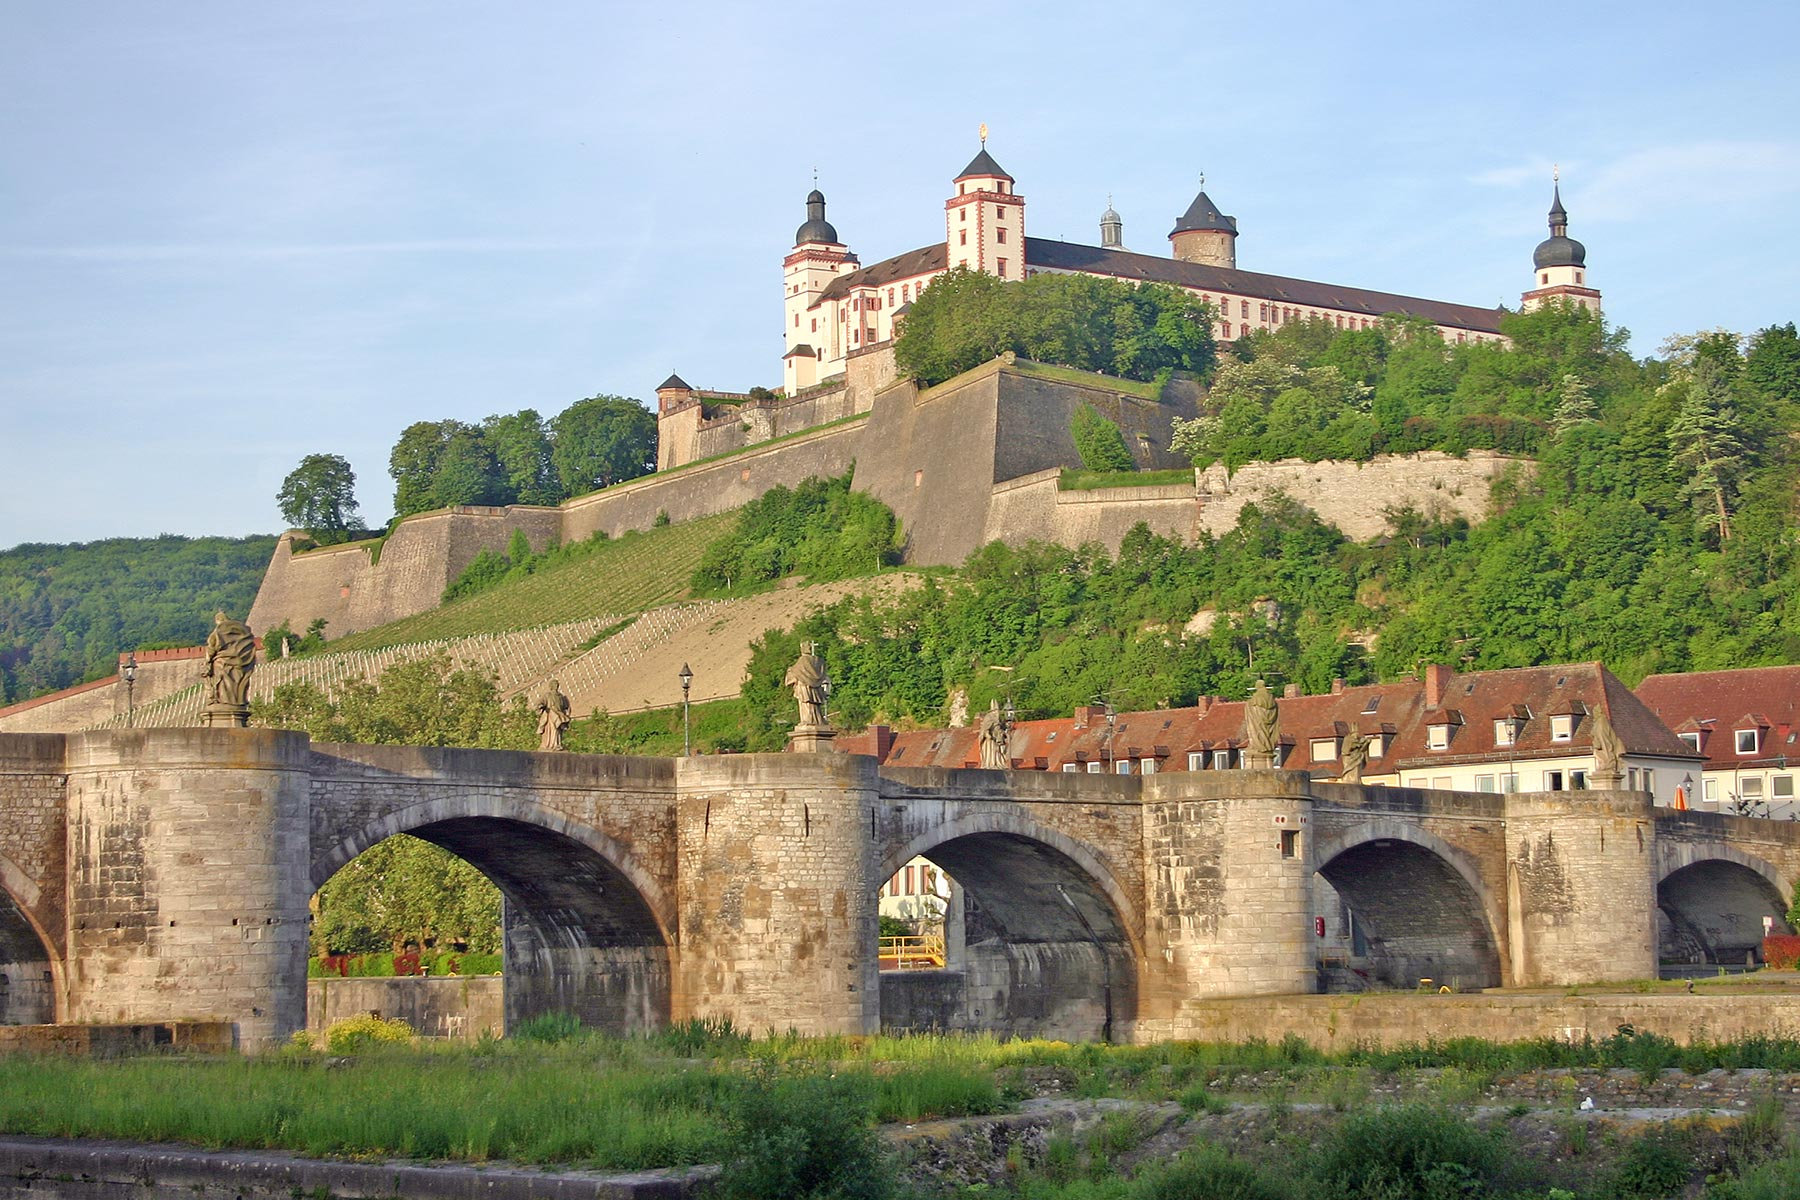 foto album Wijnreis Franken, Pfalz en Rheinhessen